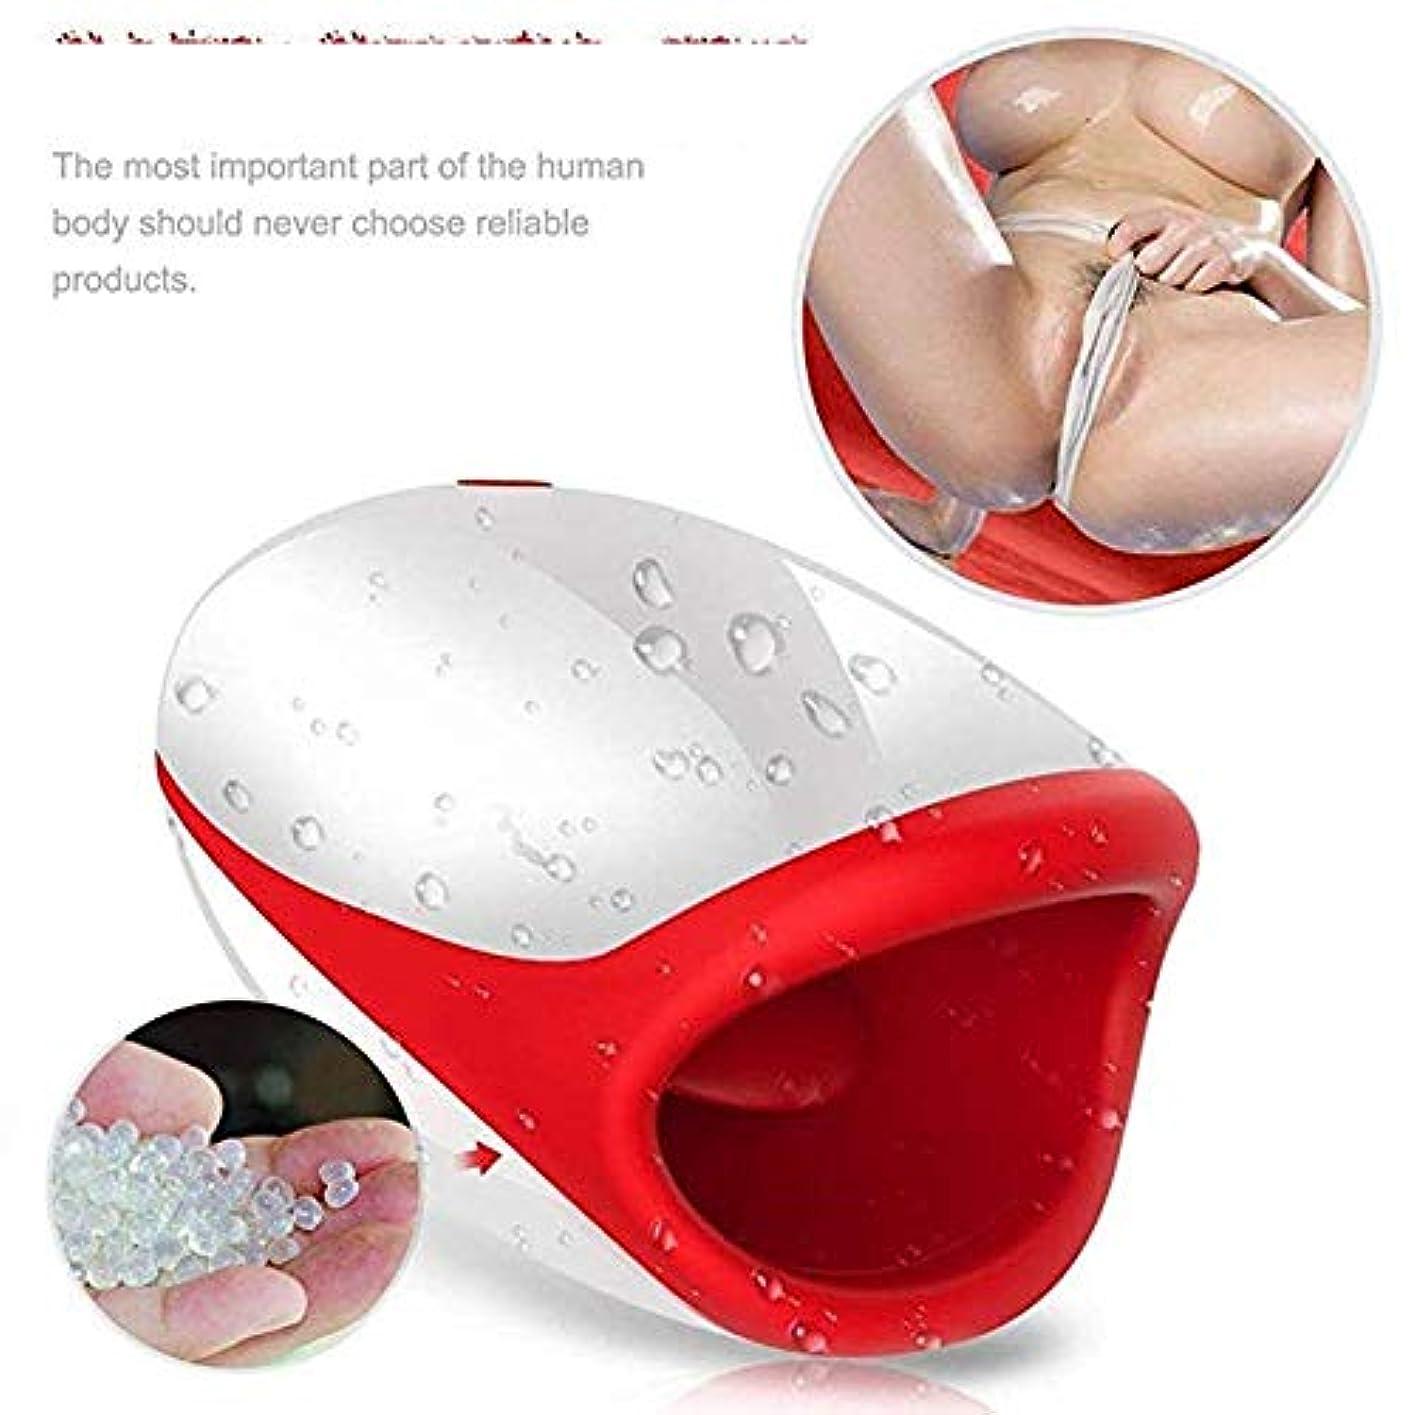 AIIALLI Ntelligent Heating Massager Electric MaleMâsturbâtorCup Telescopic Thrust And Rotating Machine Blowjob...